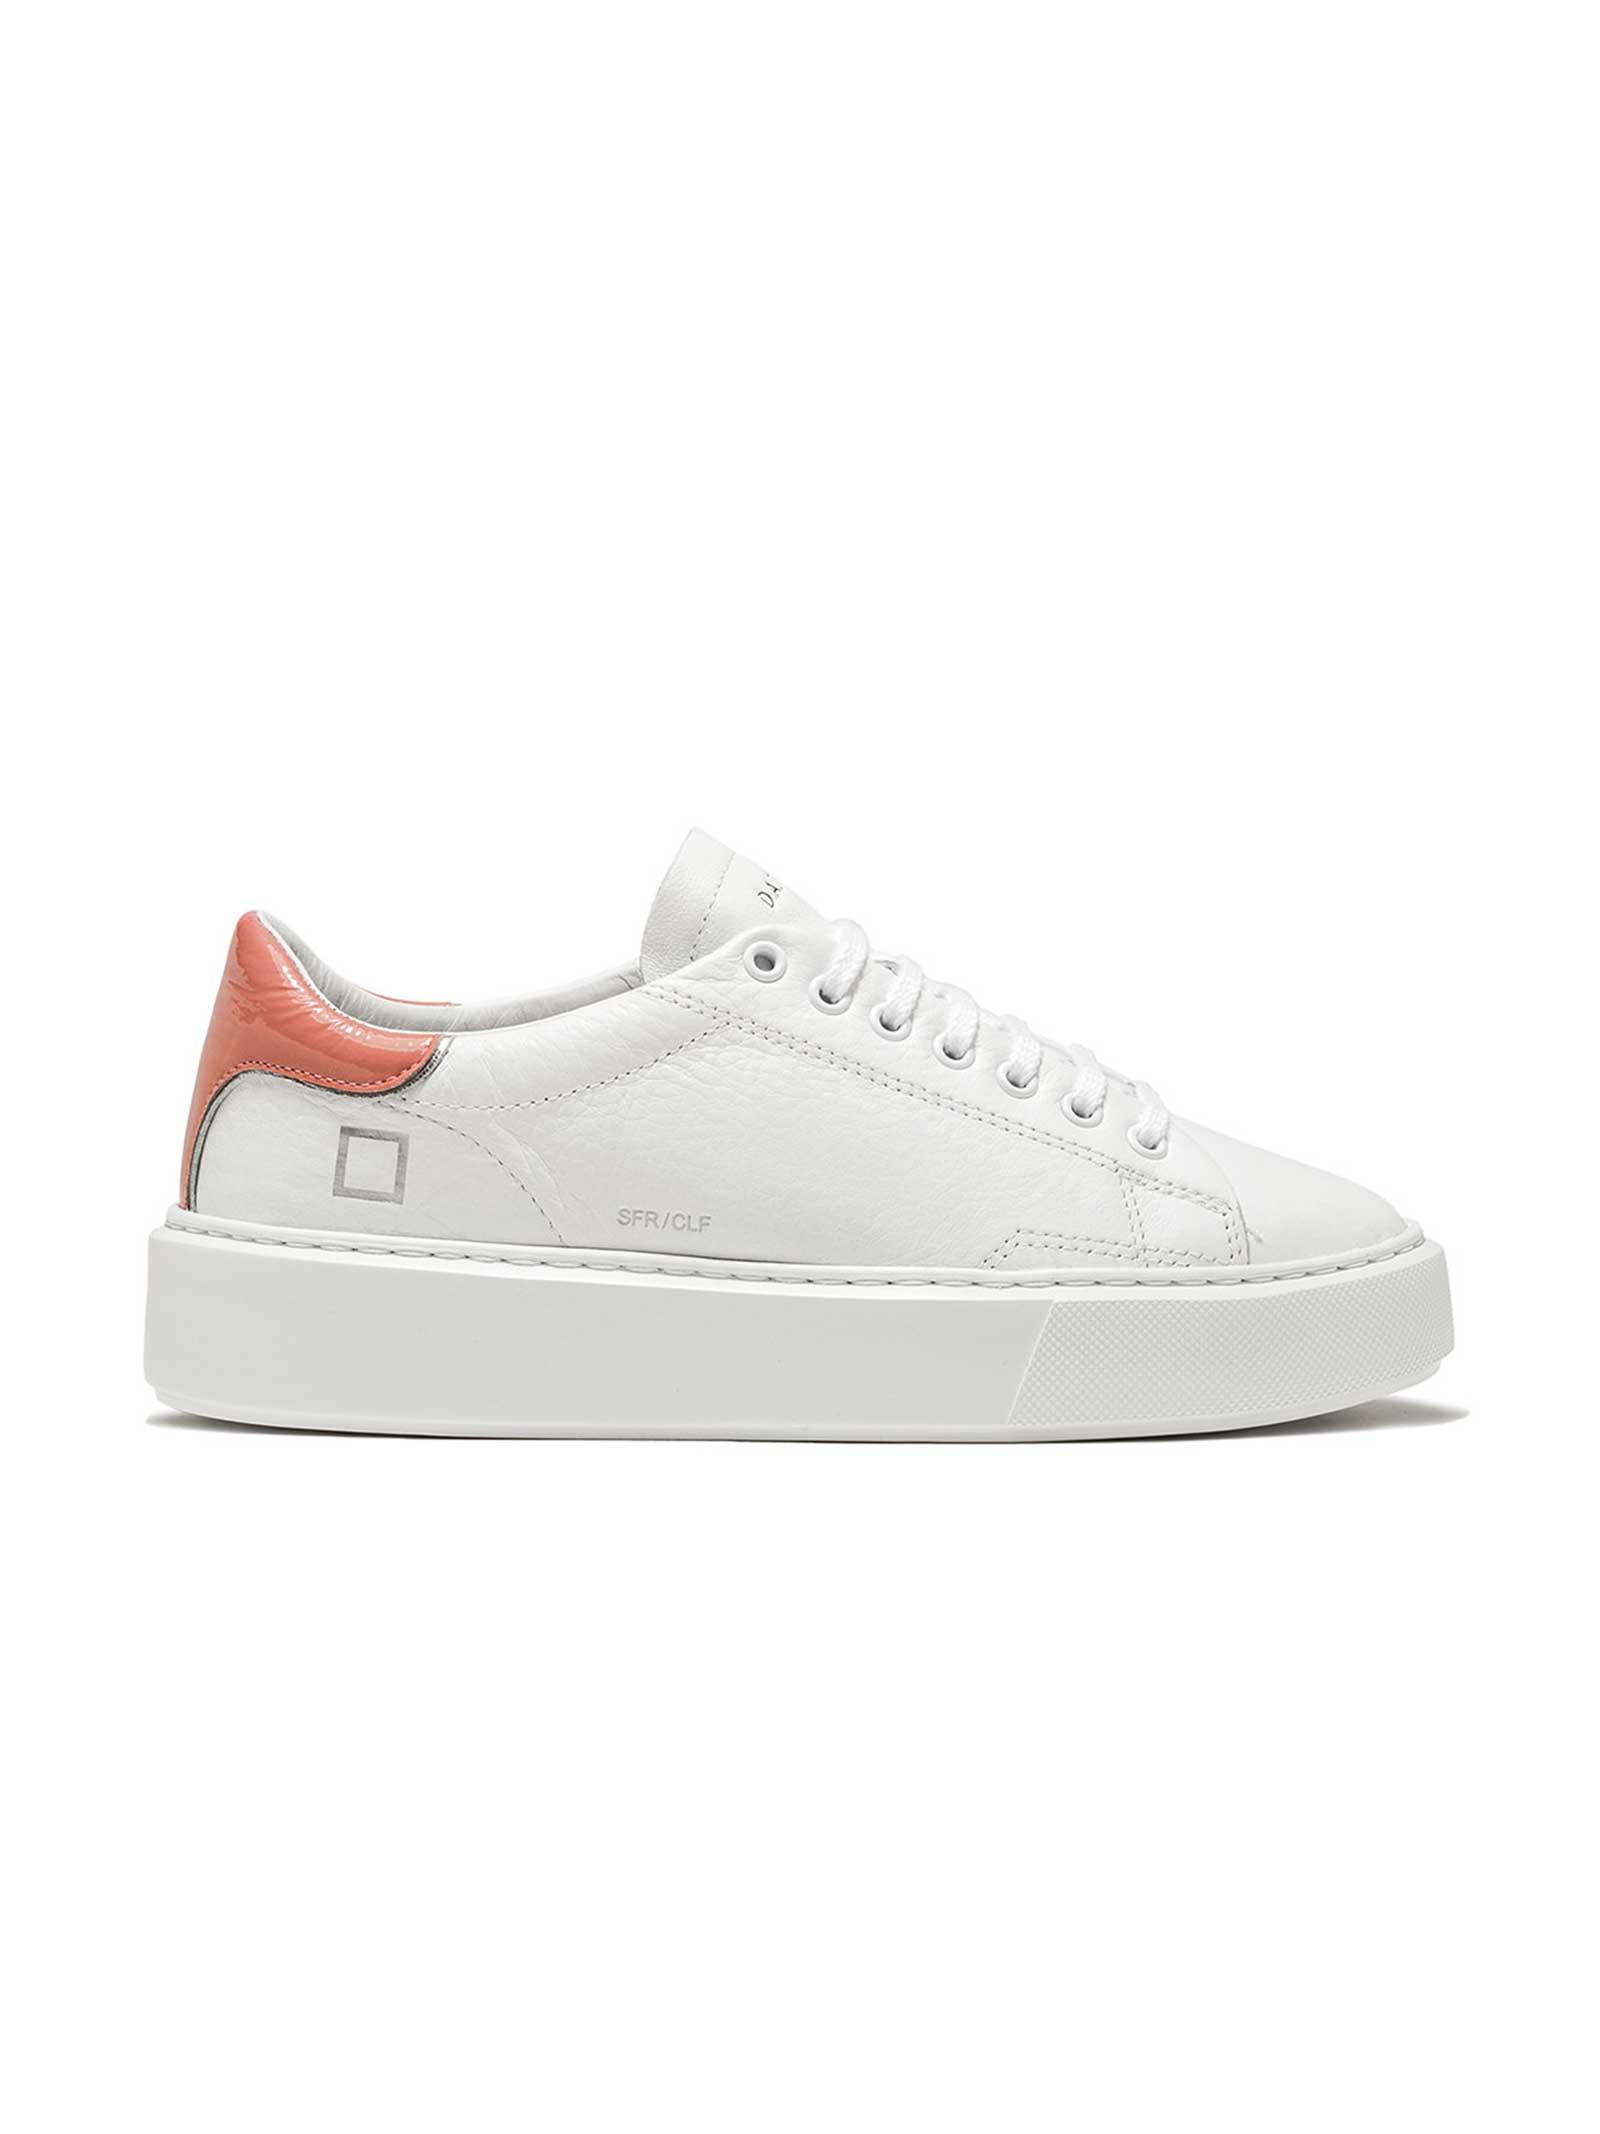 sfera calf D.A.T.E.   Sneakers   W341-SF-CA-WPWHITE-PINK